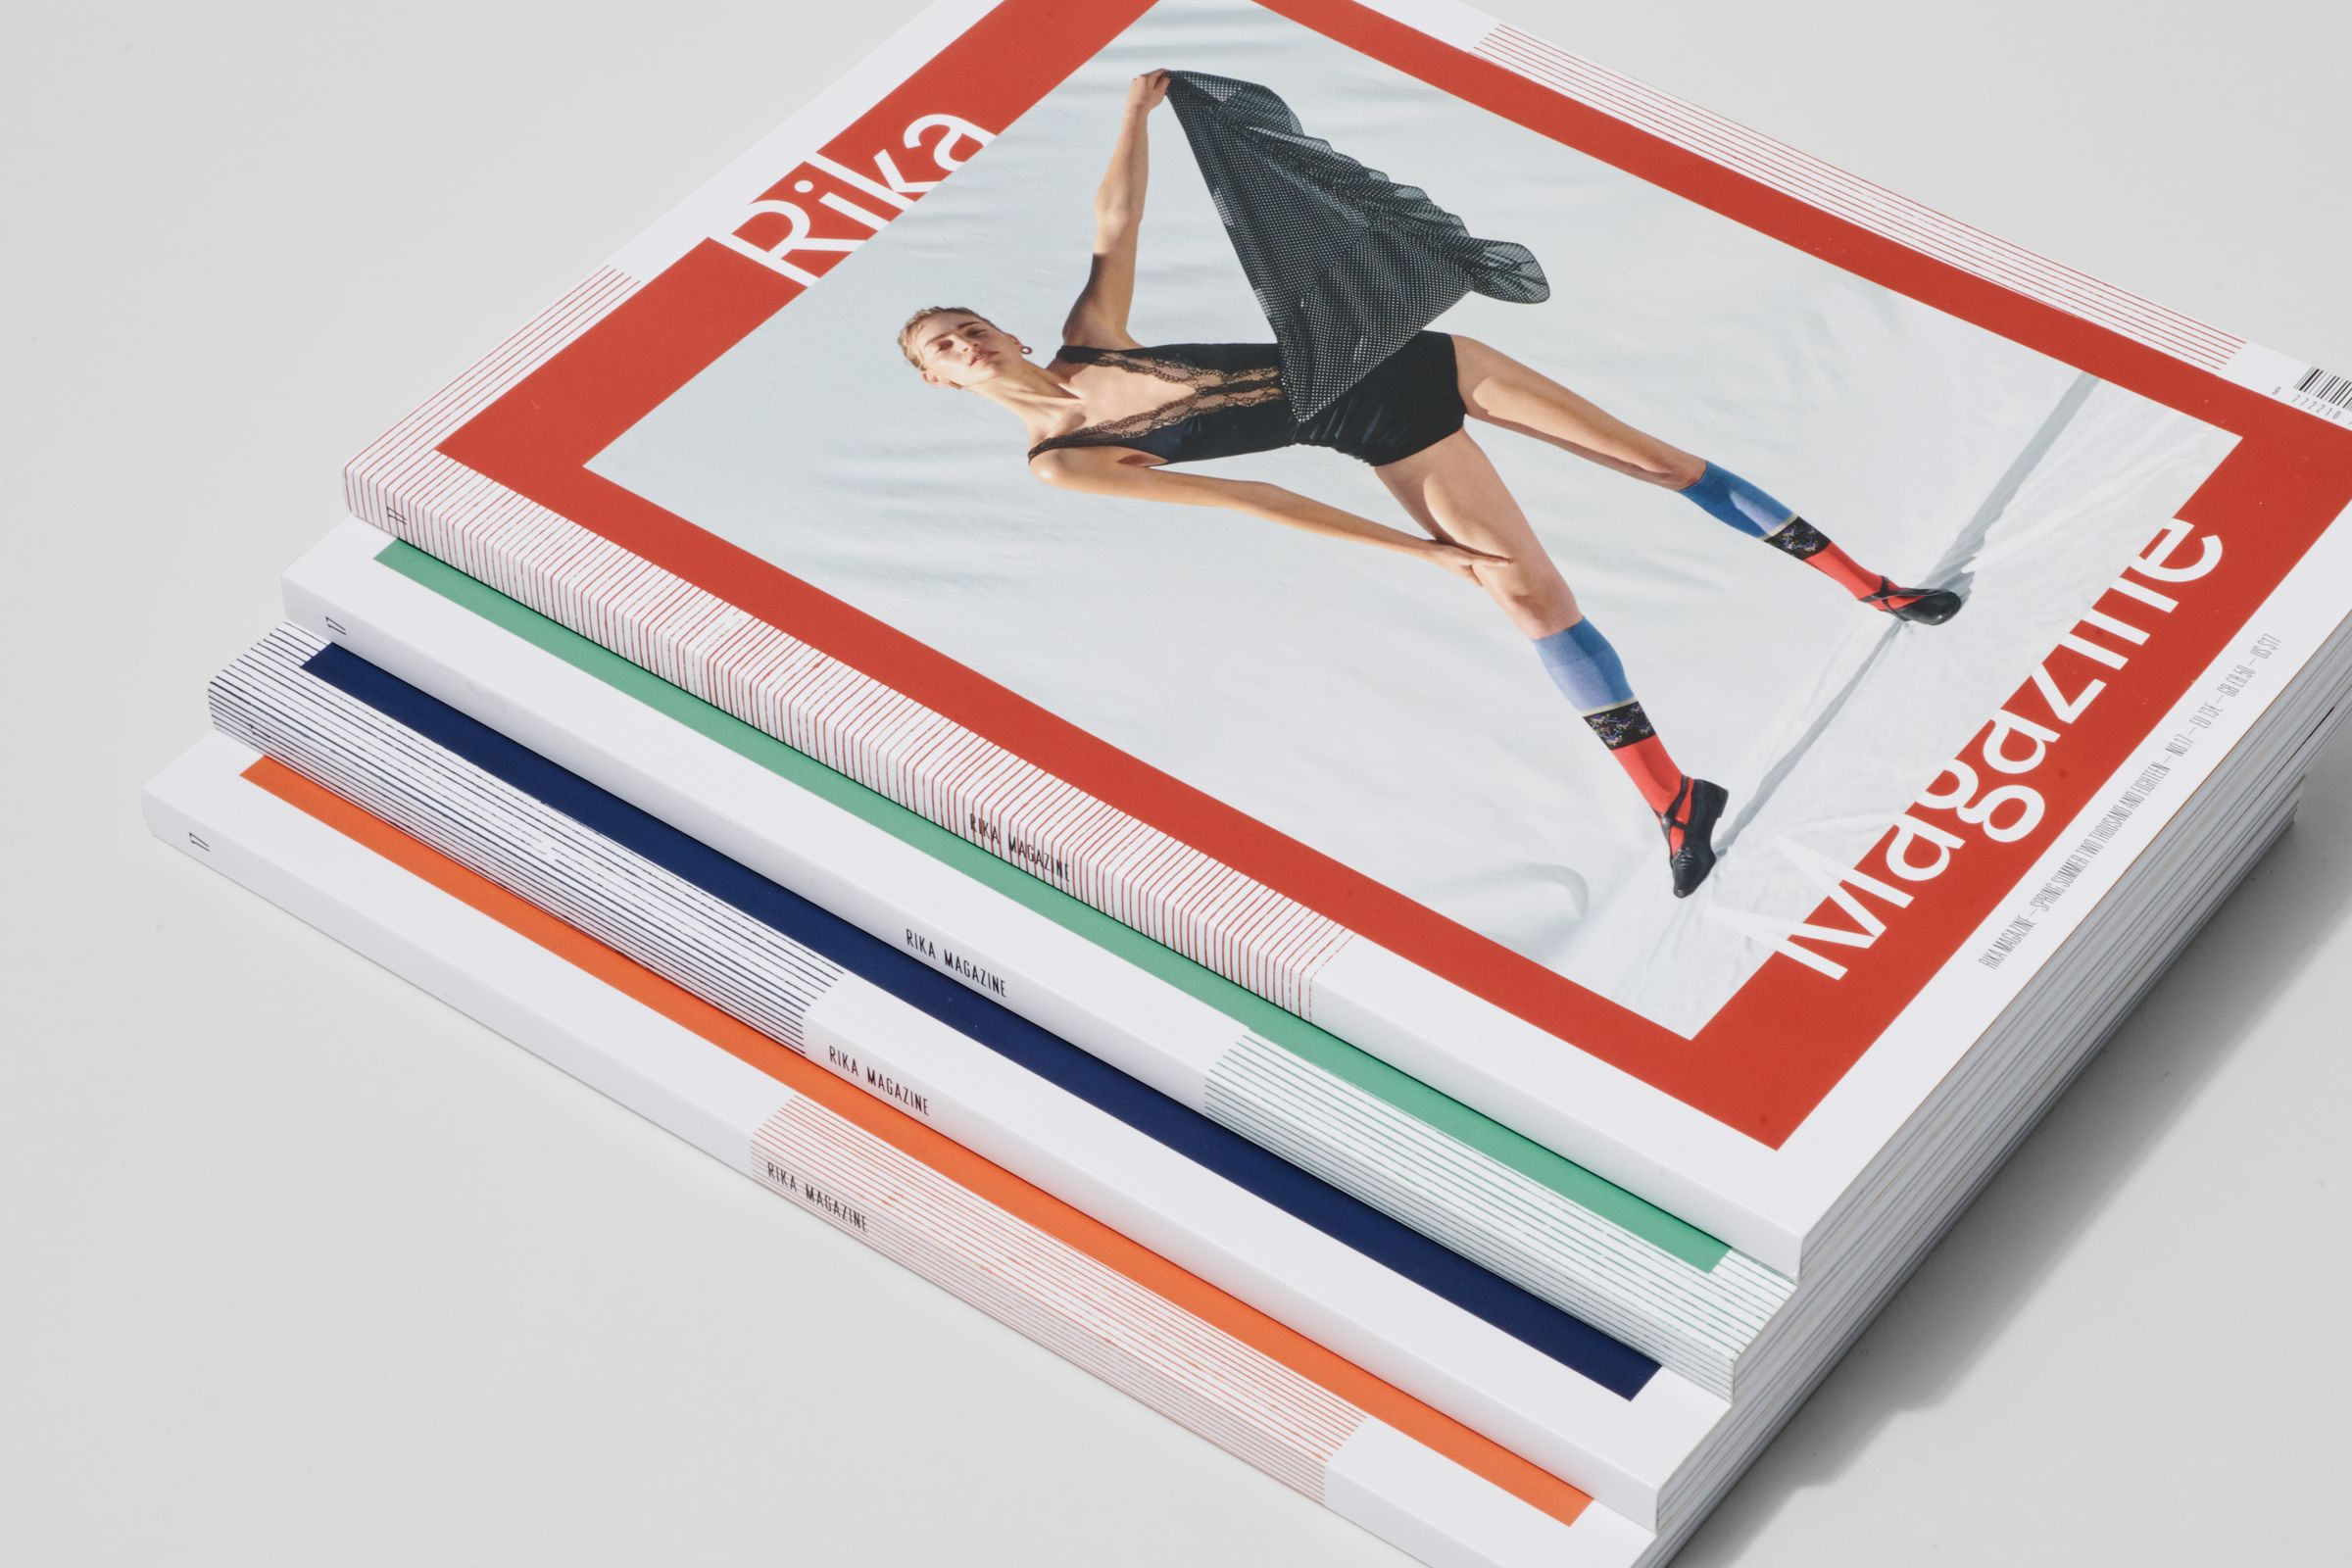 Rika Magazine issue no. 17 cover design